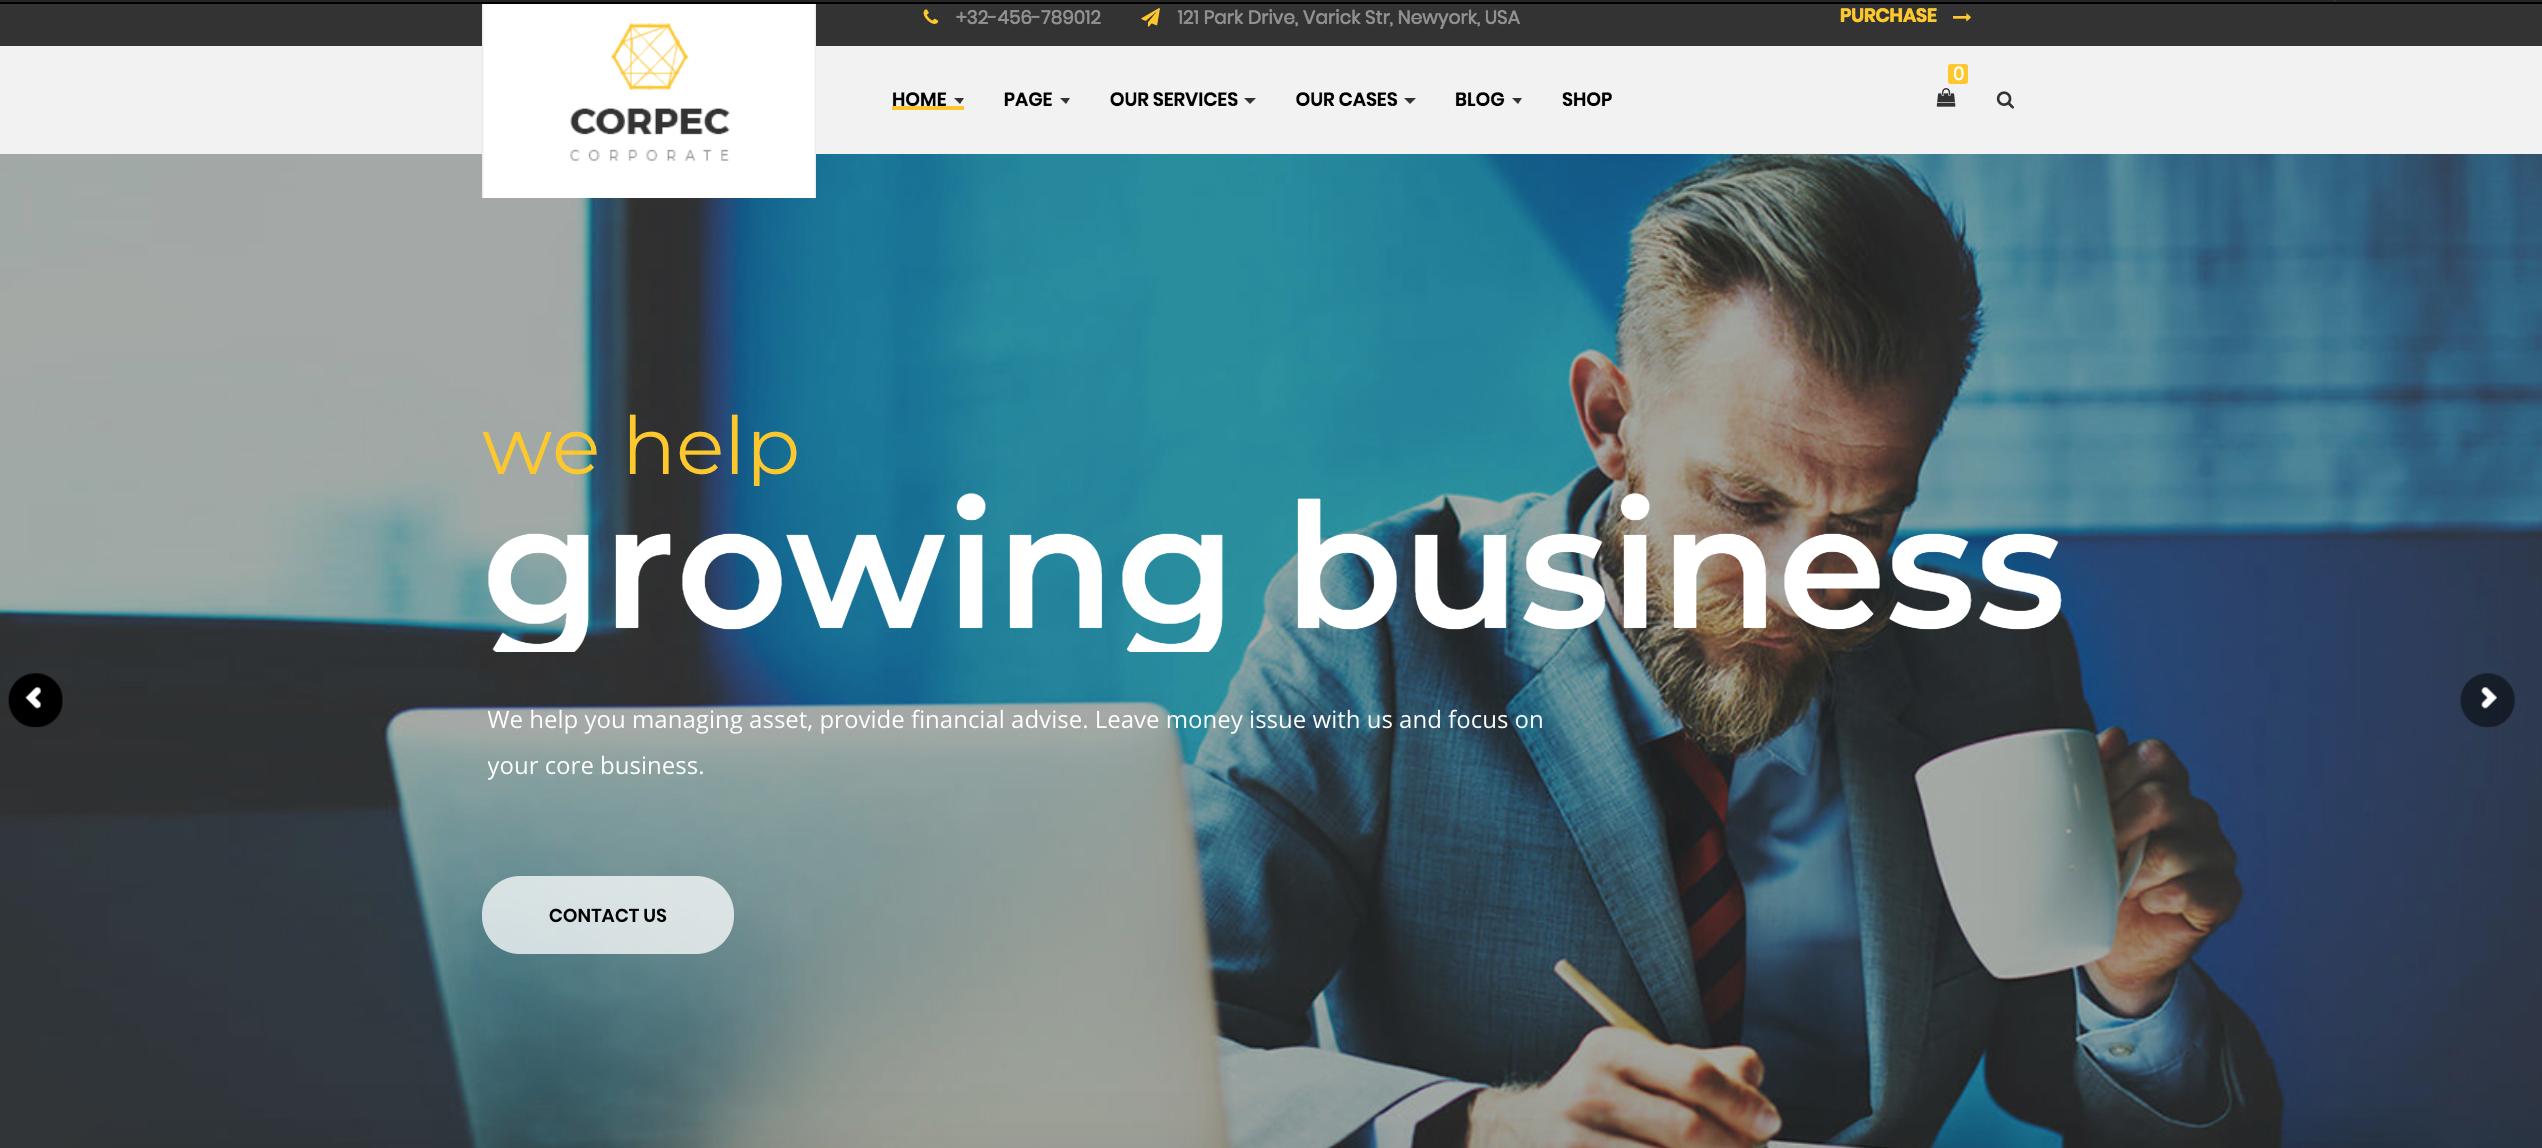 Corpec - Corporate WordPress Theme